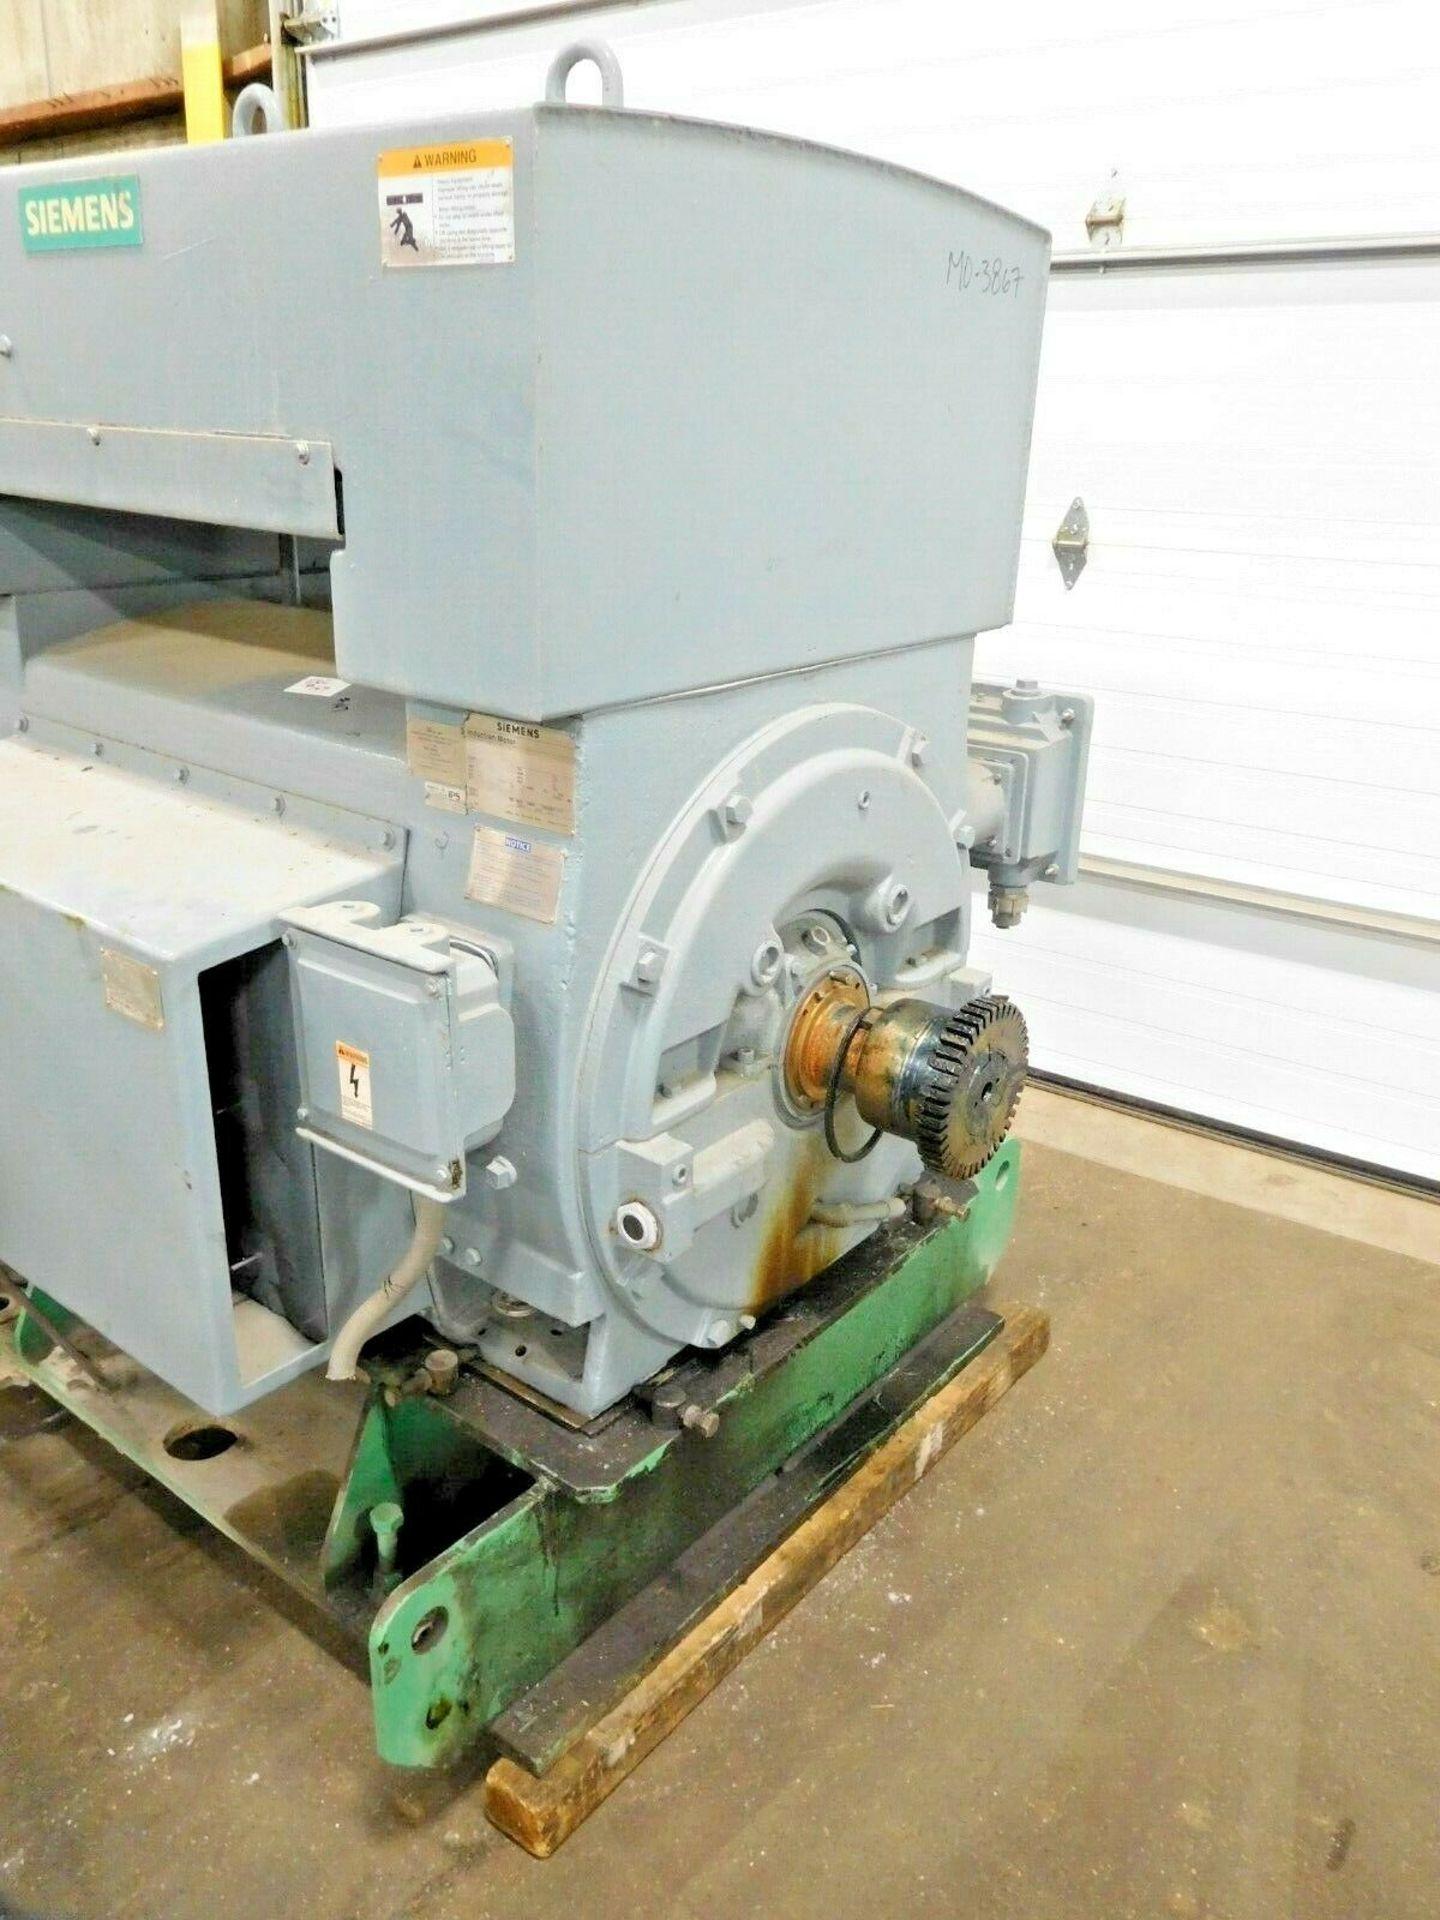 Siemens 1100 HP Electric Motor. 4000 V. 3 Ph. 1783 RPM. CGII. 5810S. 60 Hz. - Image 2 of 3